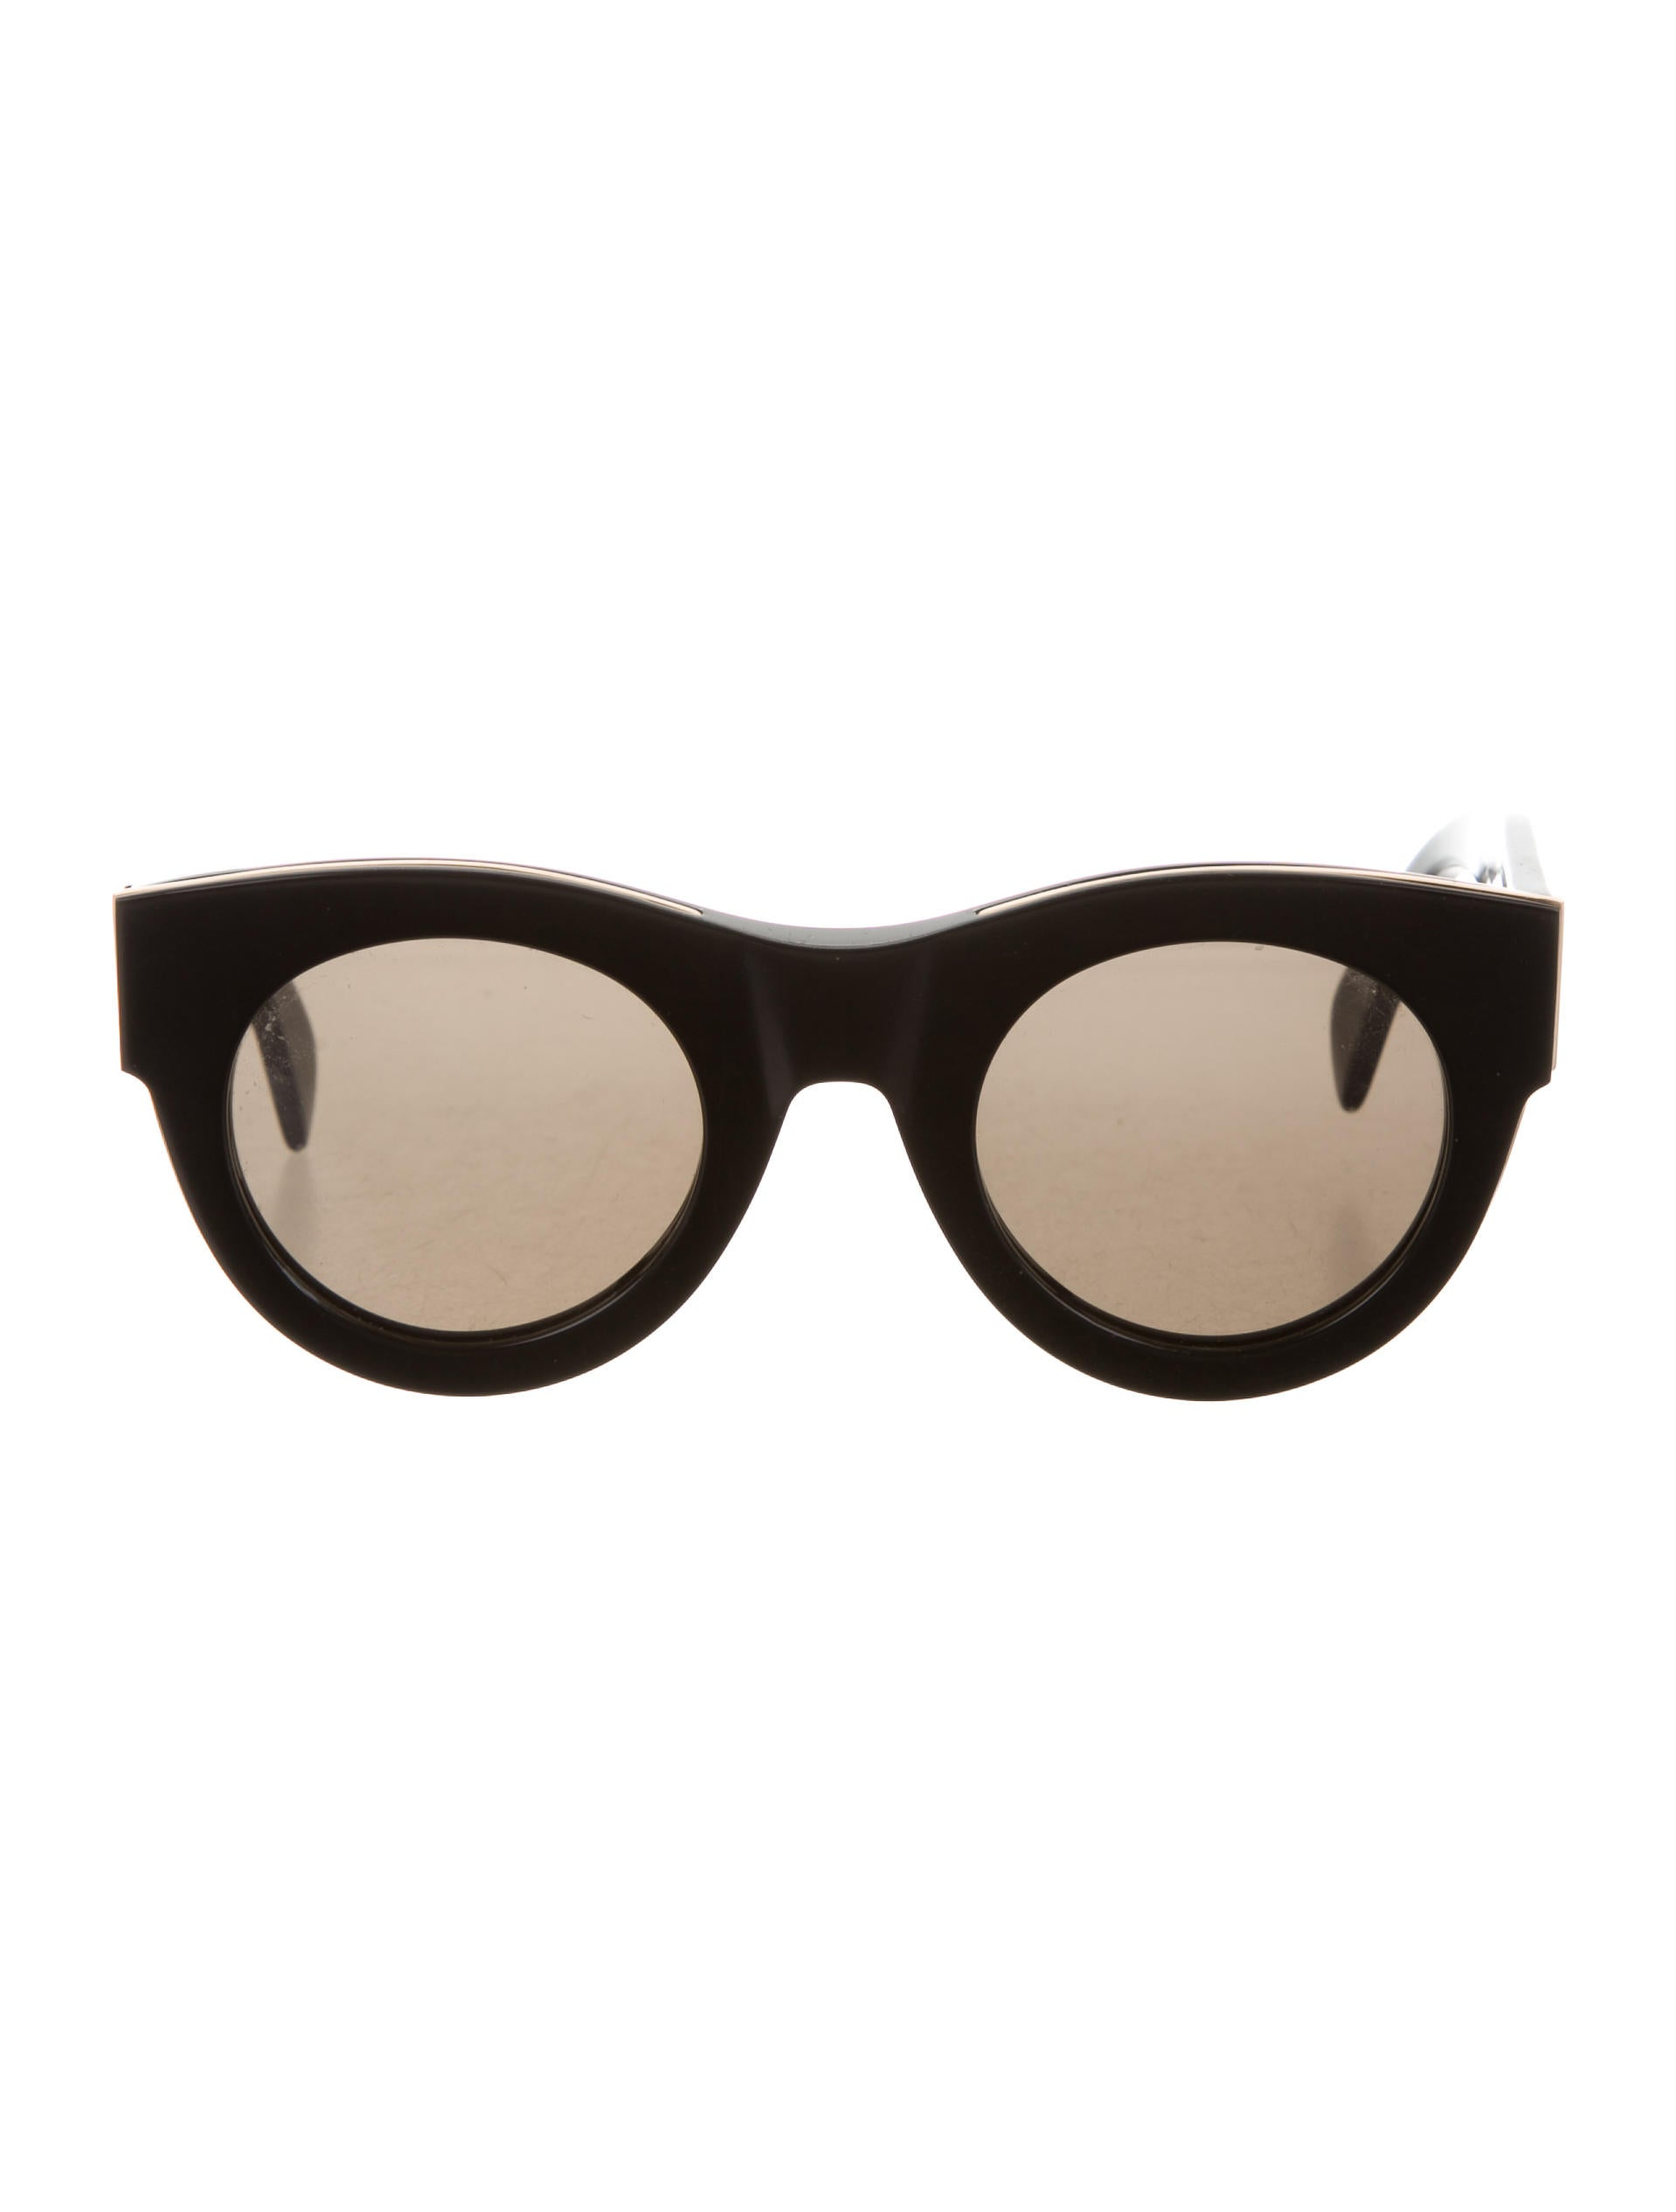 481cf6a6517 Céline Strat Circle Sunglasses - Accessories - CEL56026